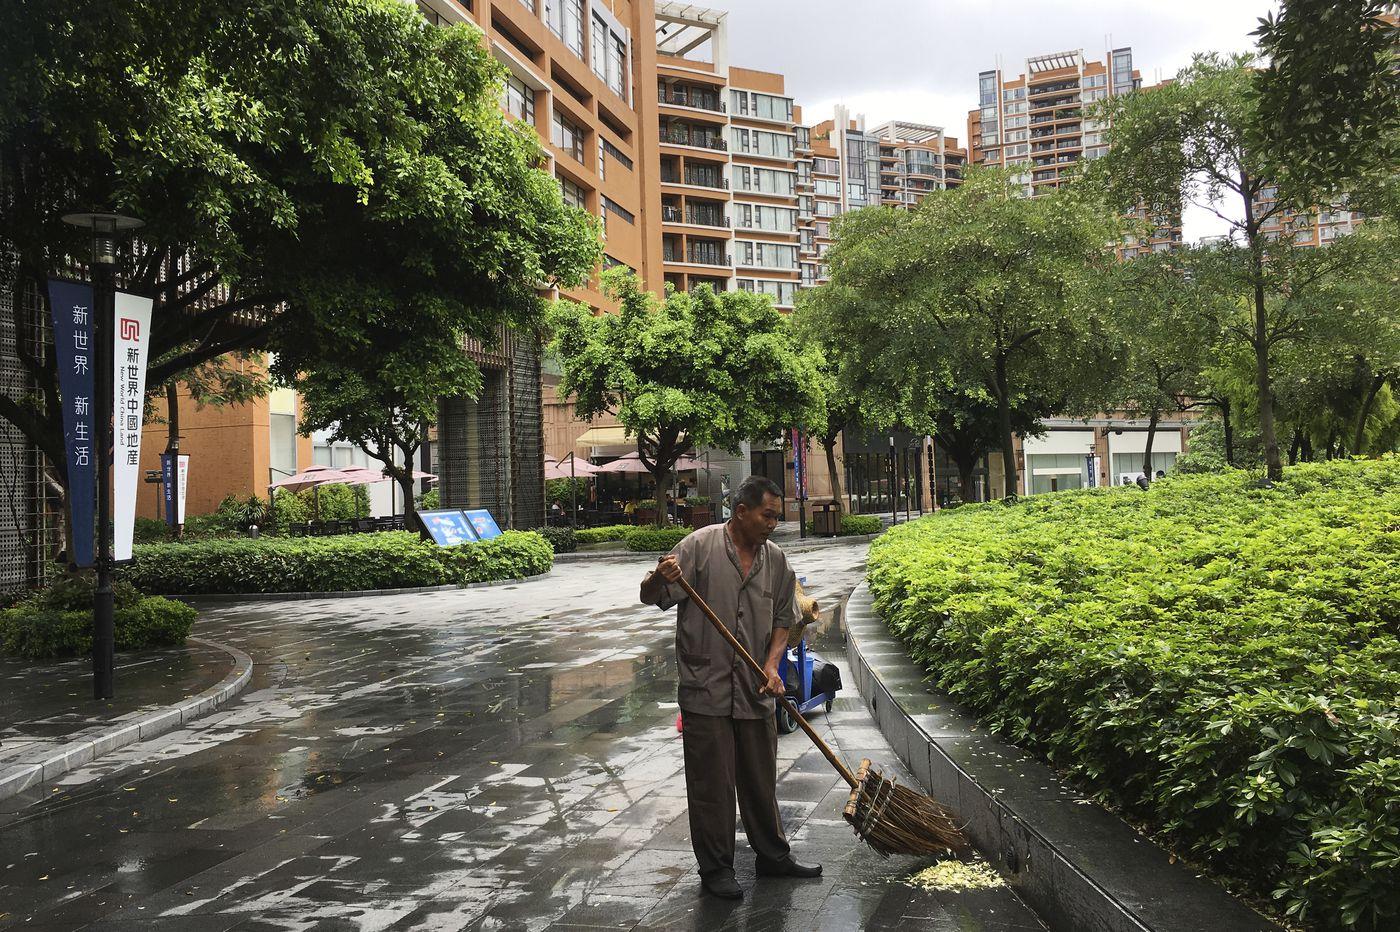 First Cuba, now China: Penn studies mysterious brain symptoms